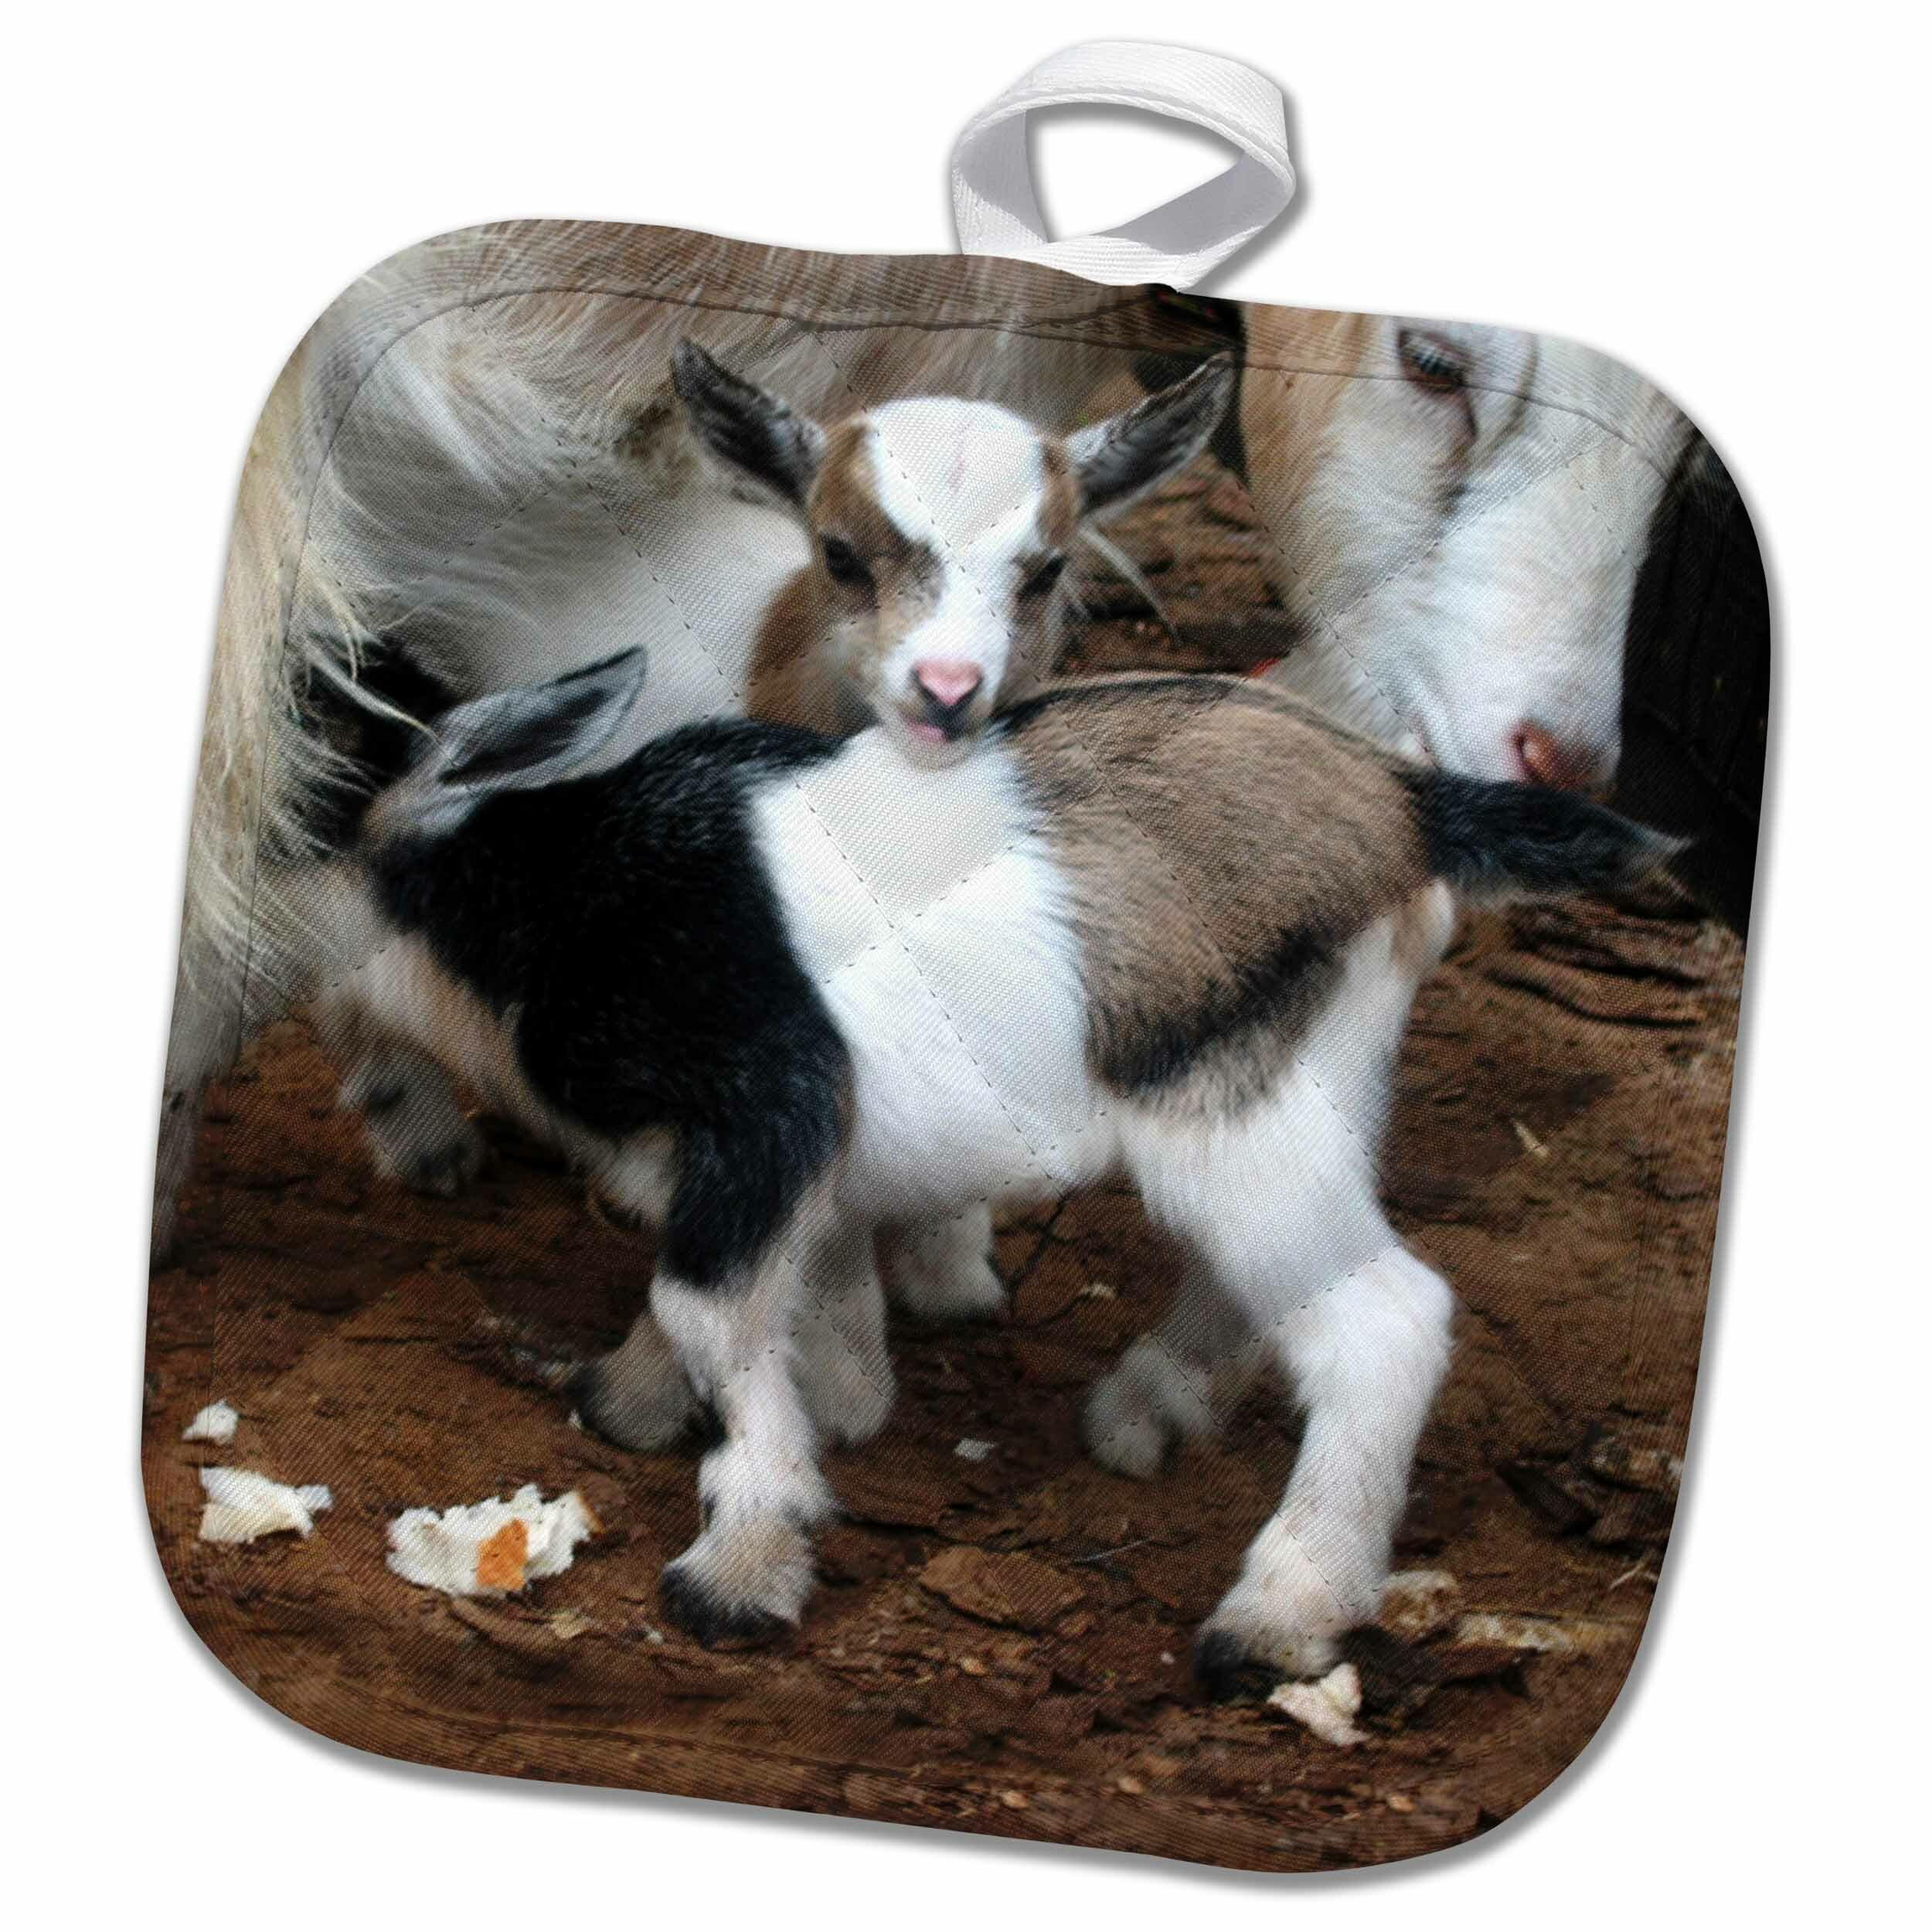 Pygmy Goat Family Pot Holder